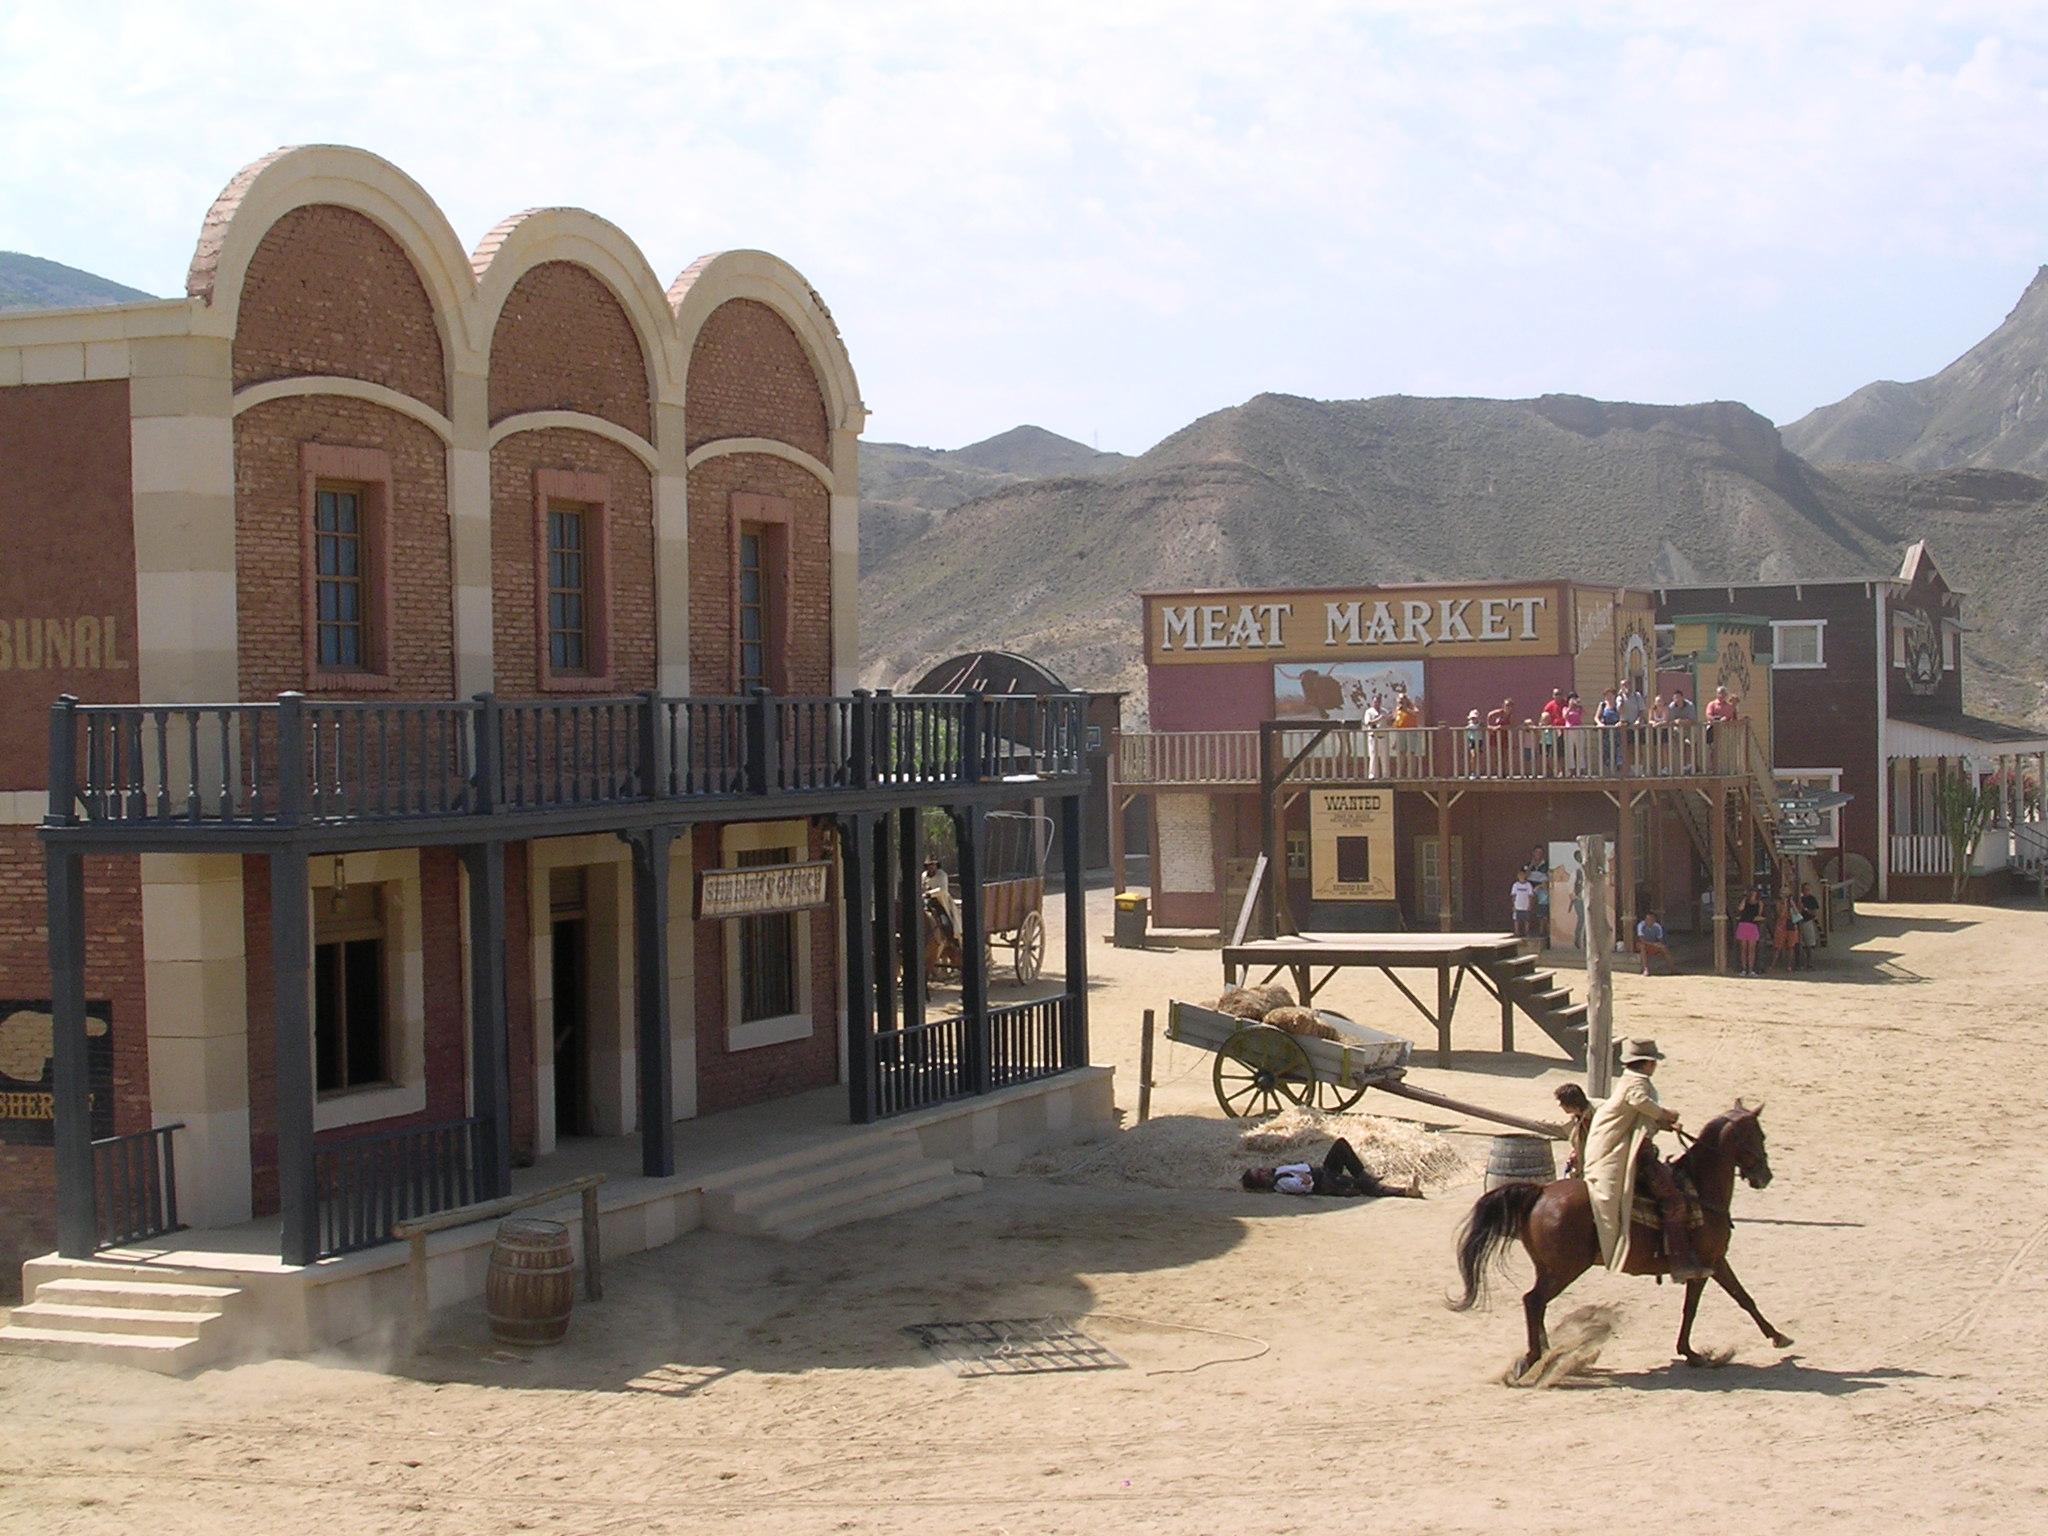 Depiction of Spaghetti western